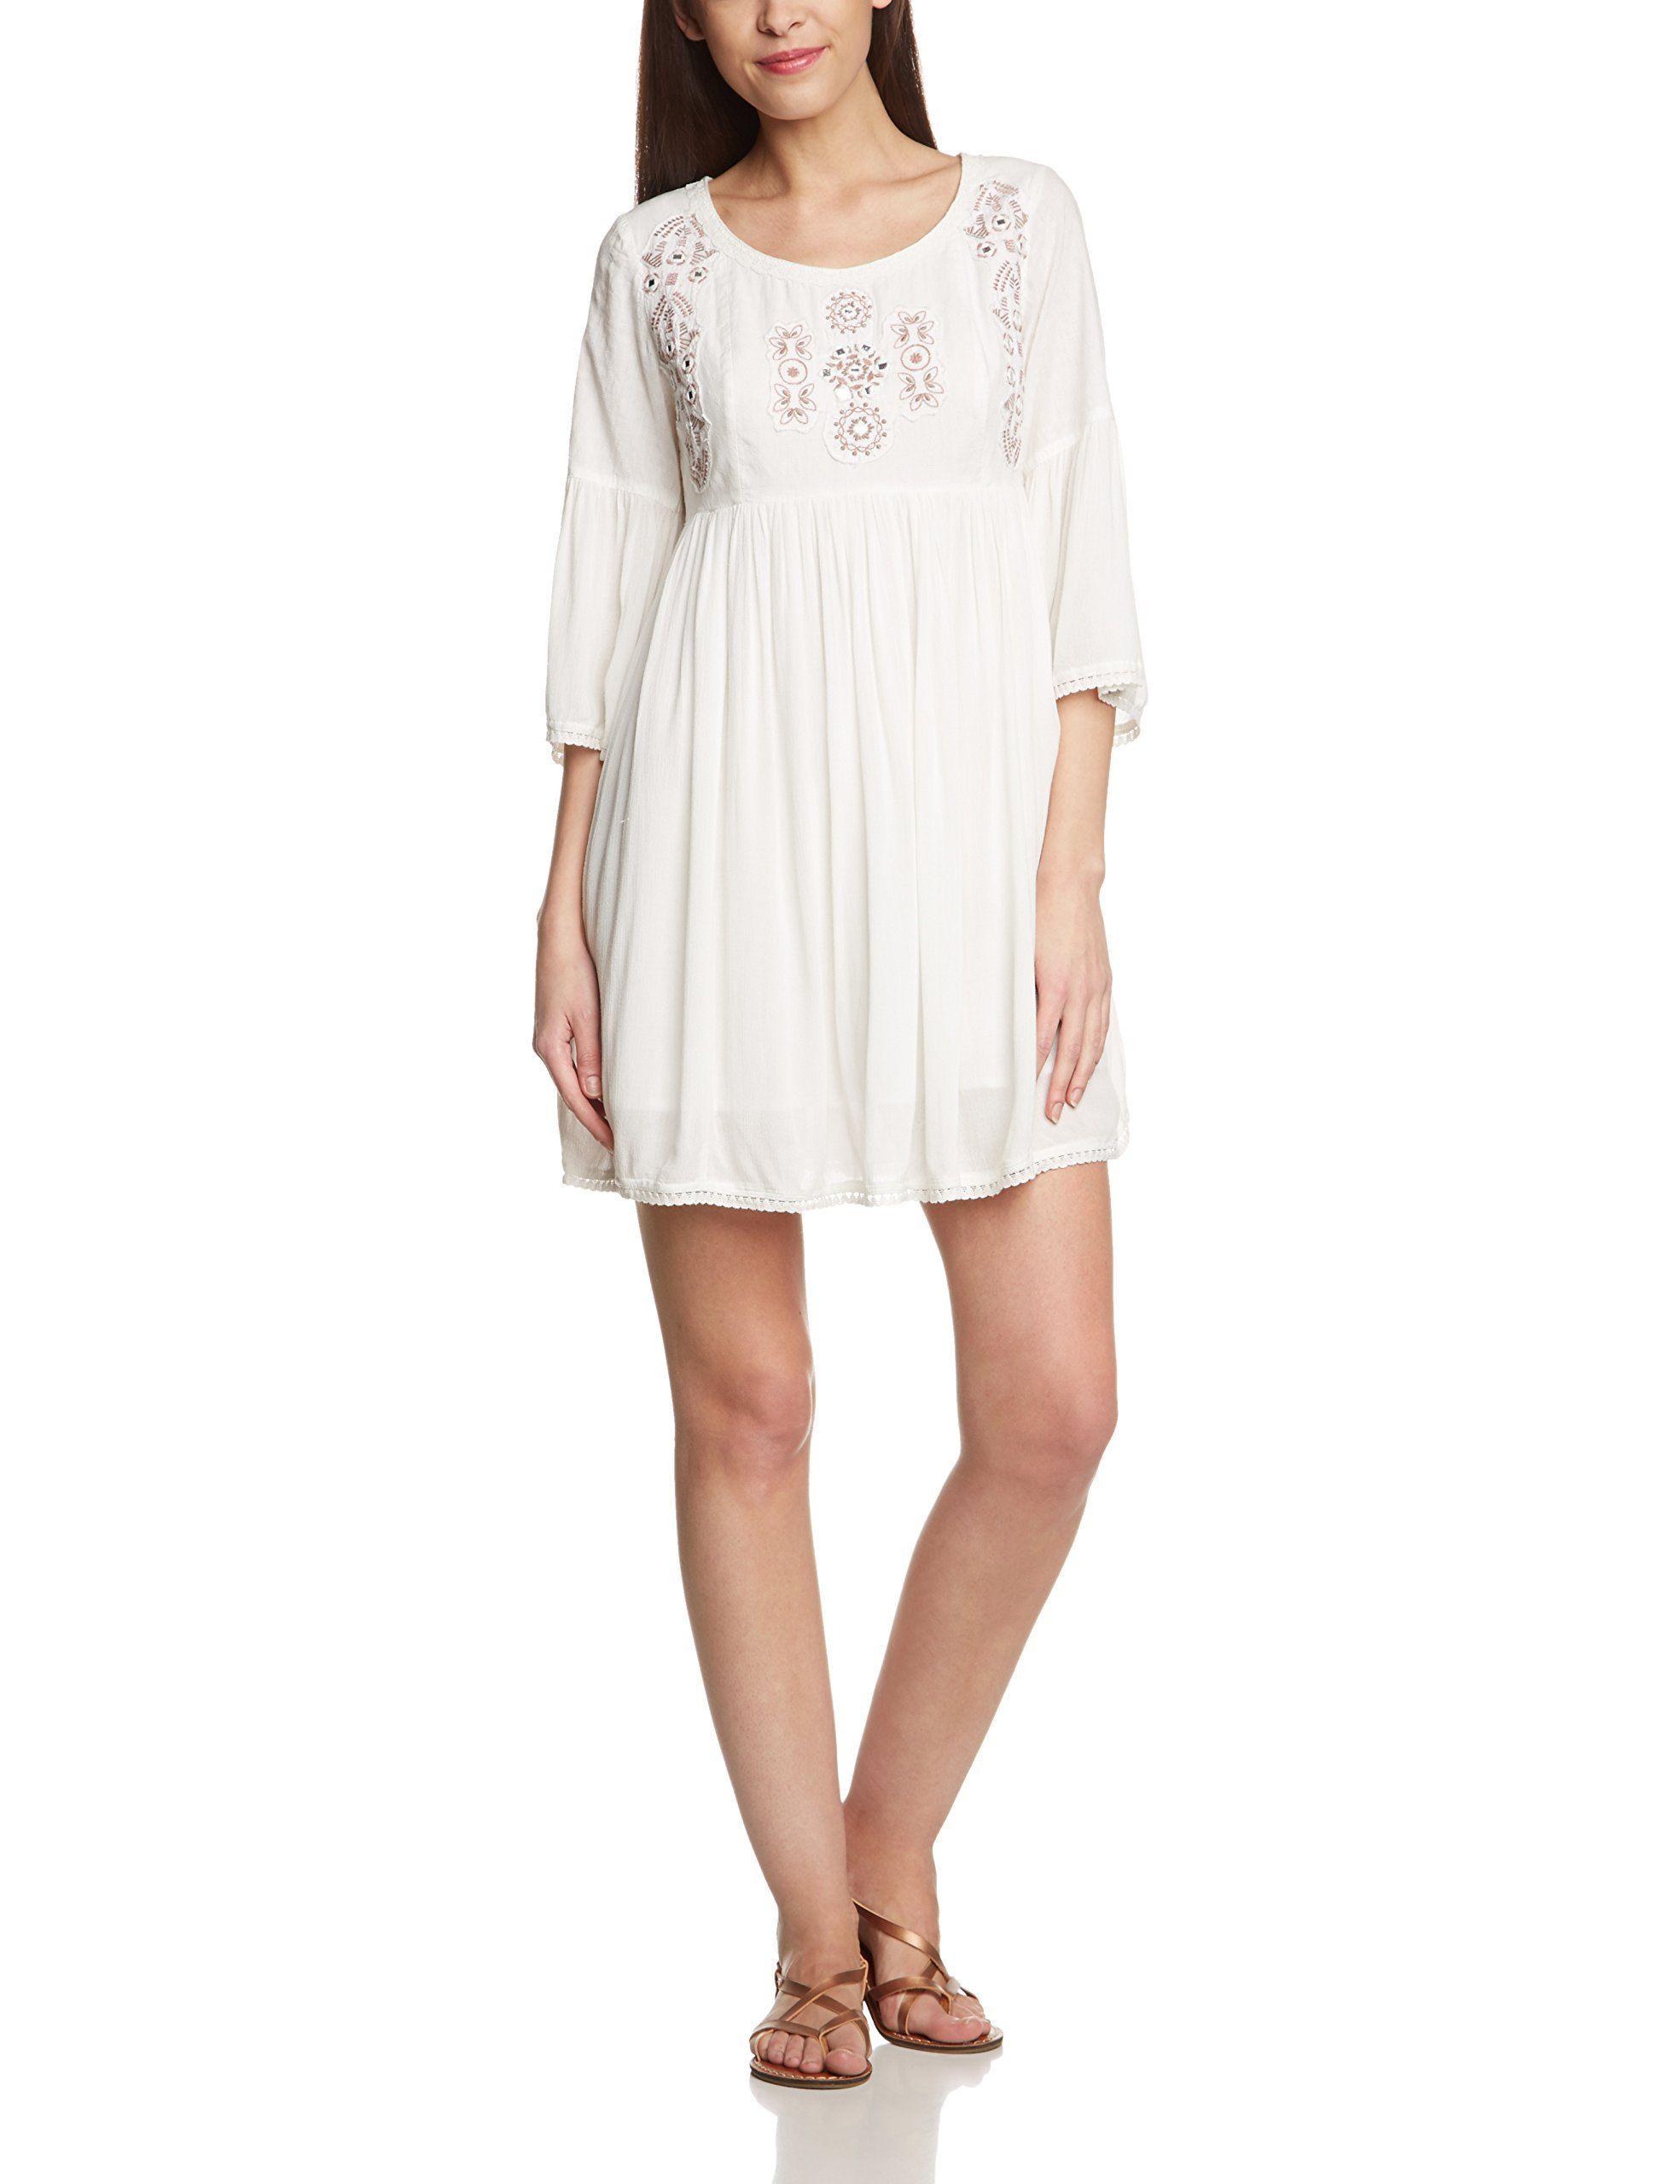 Cream Damen Tunika Kleid Sophia Tunic Midi Einfarbig Gr